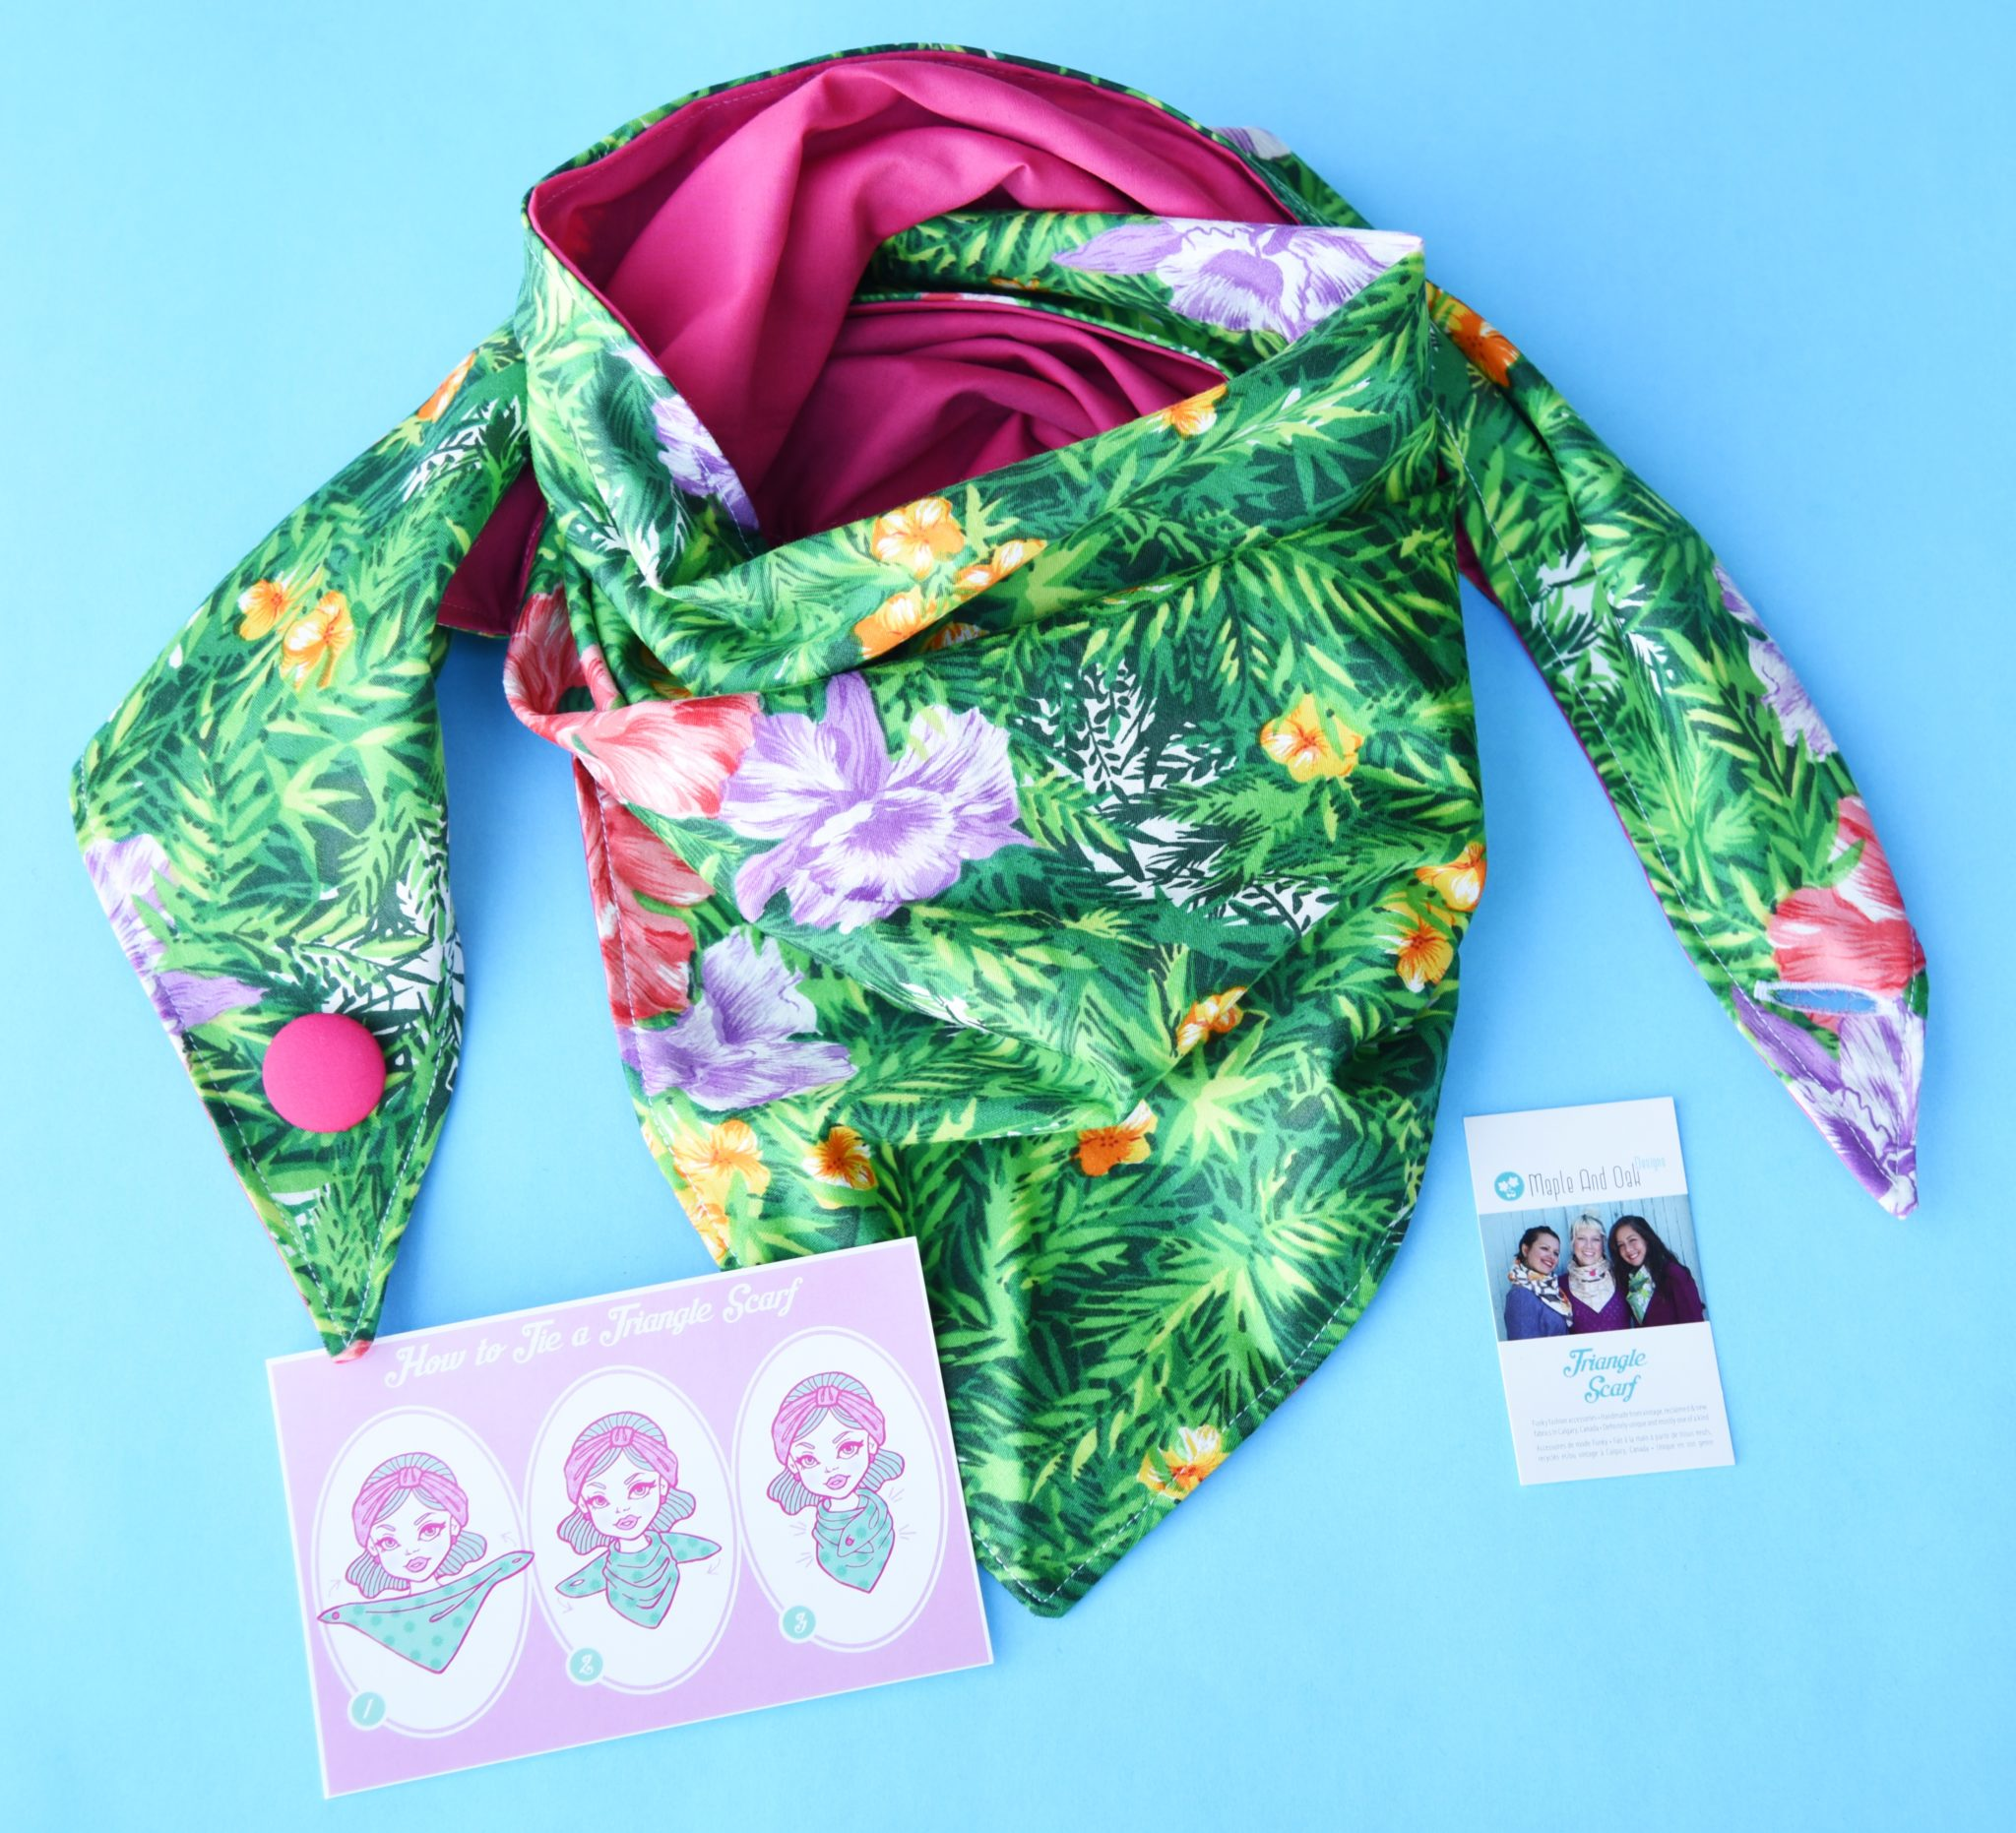 Triangle Scarves - Green jungle print. Pink, yellow, orange ...